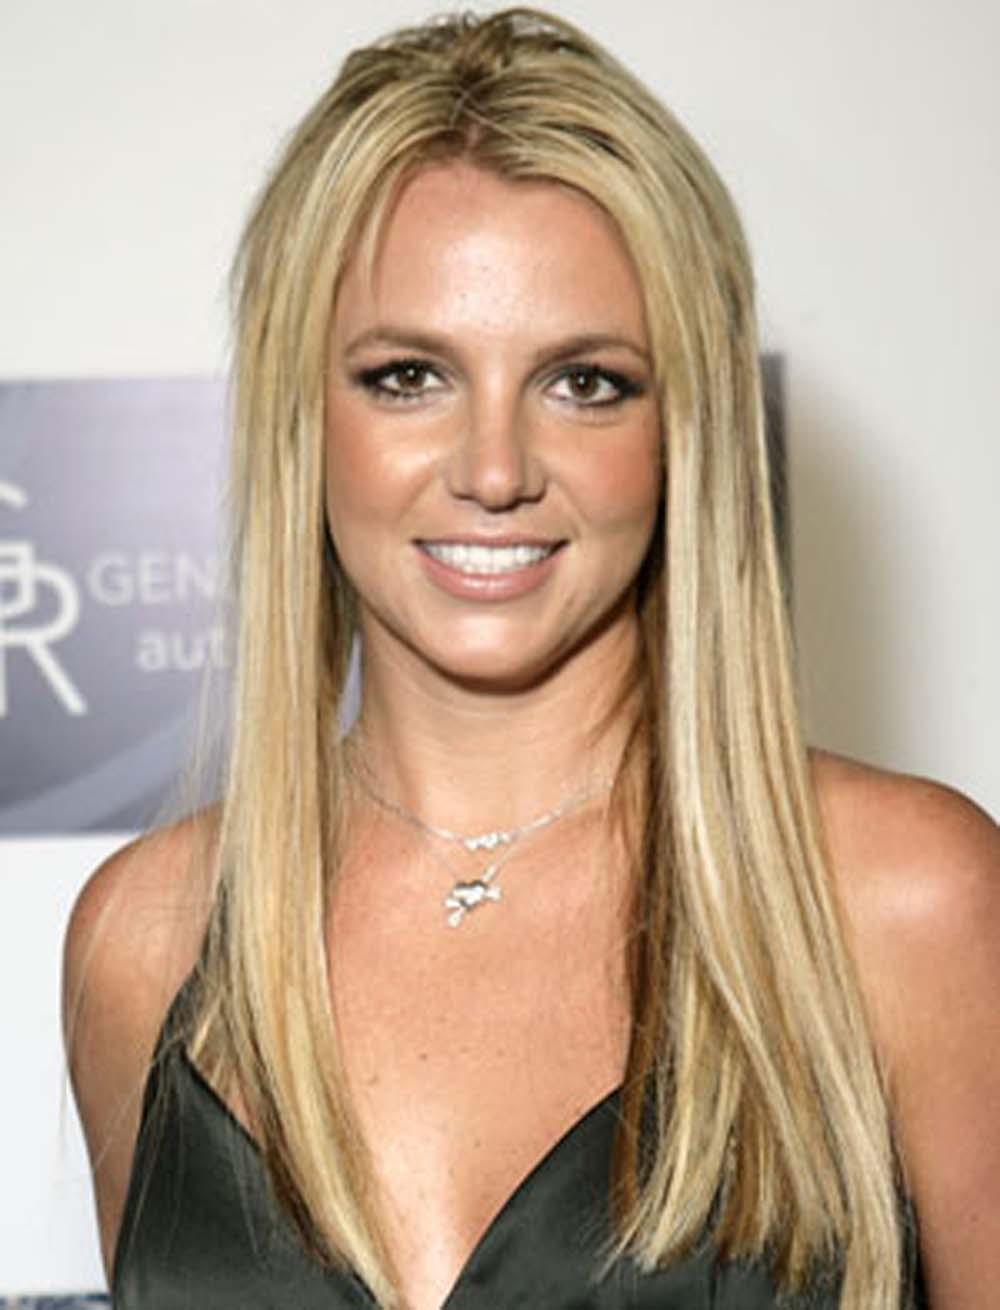 Britney spear: Britney Spears hairstyles Britney Spears